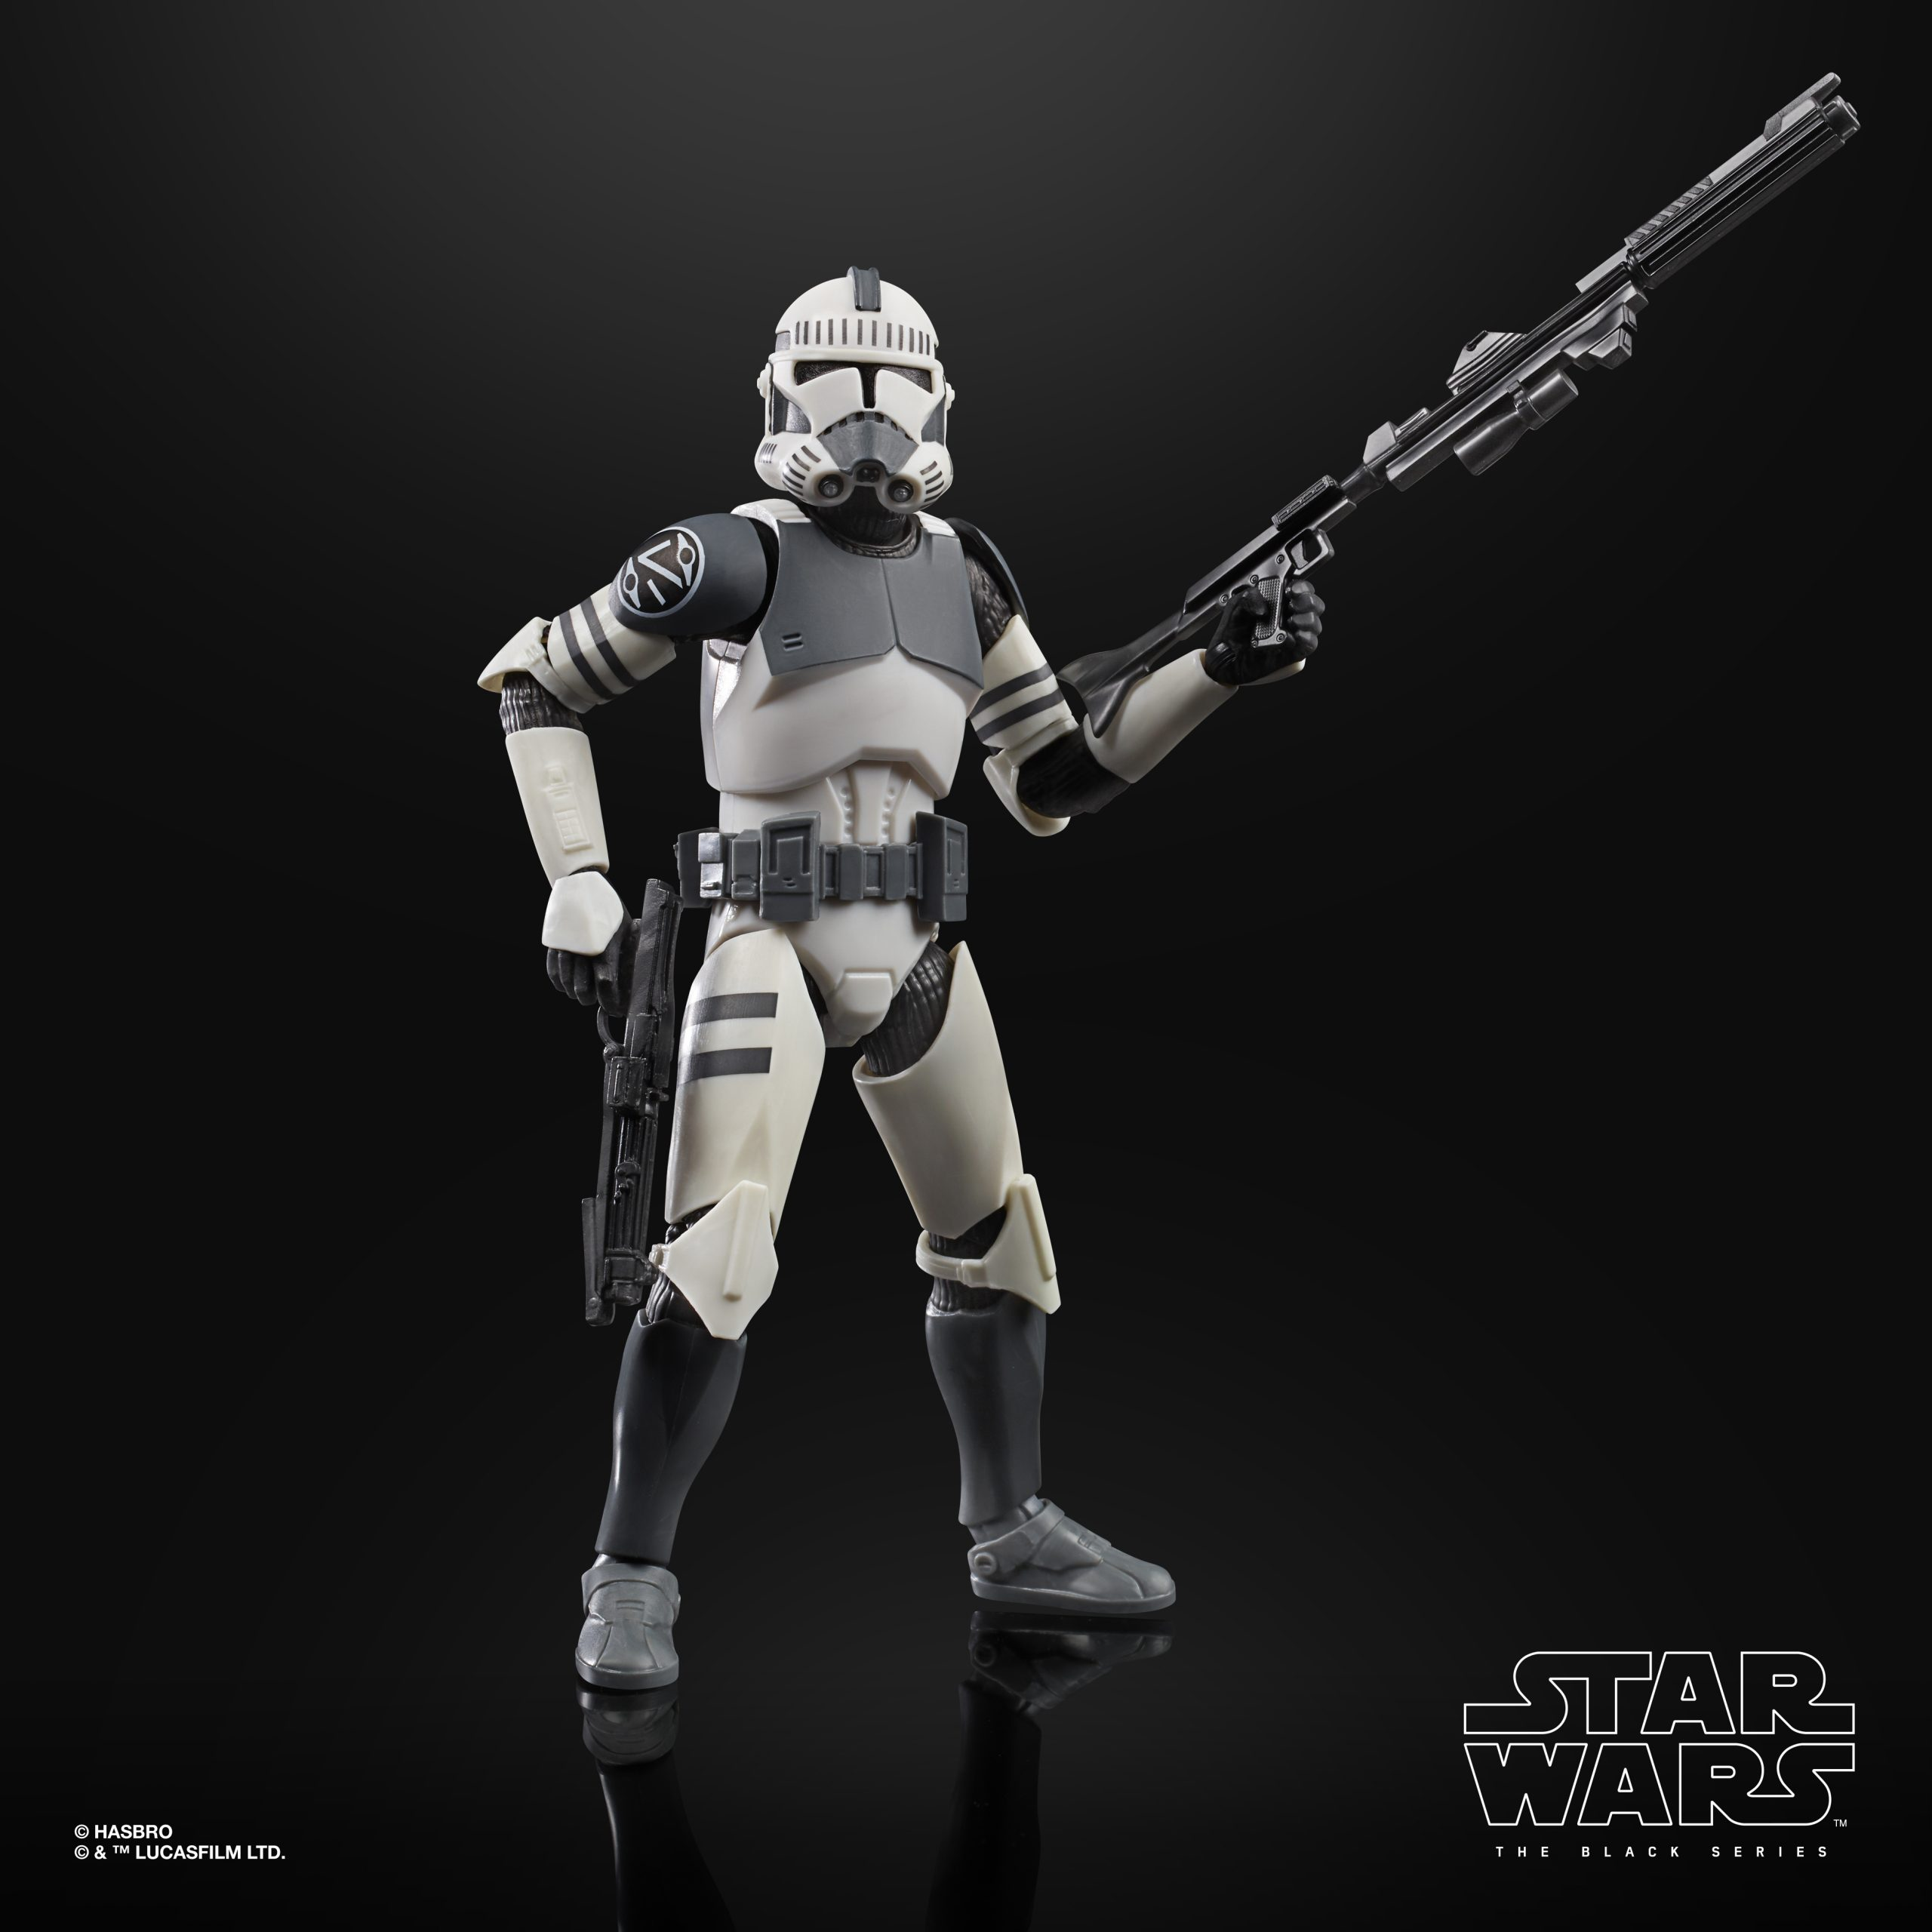 Ahsoka Tano Boba Fett,Chewie or Clone Trooper Star Wars MFP HASBRO *Brand New*